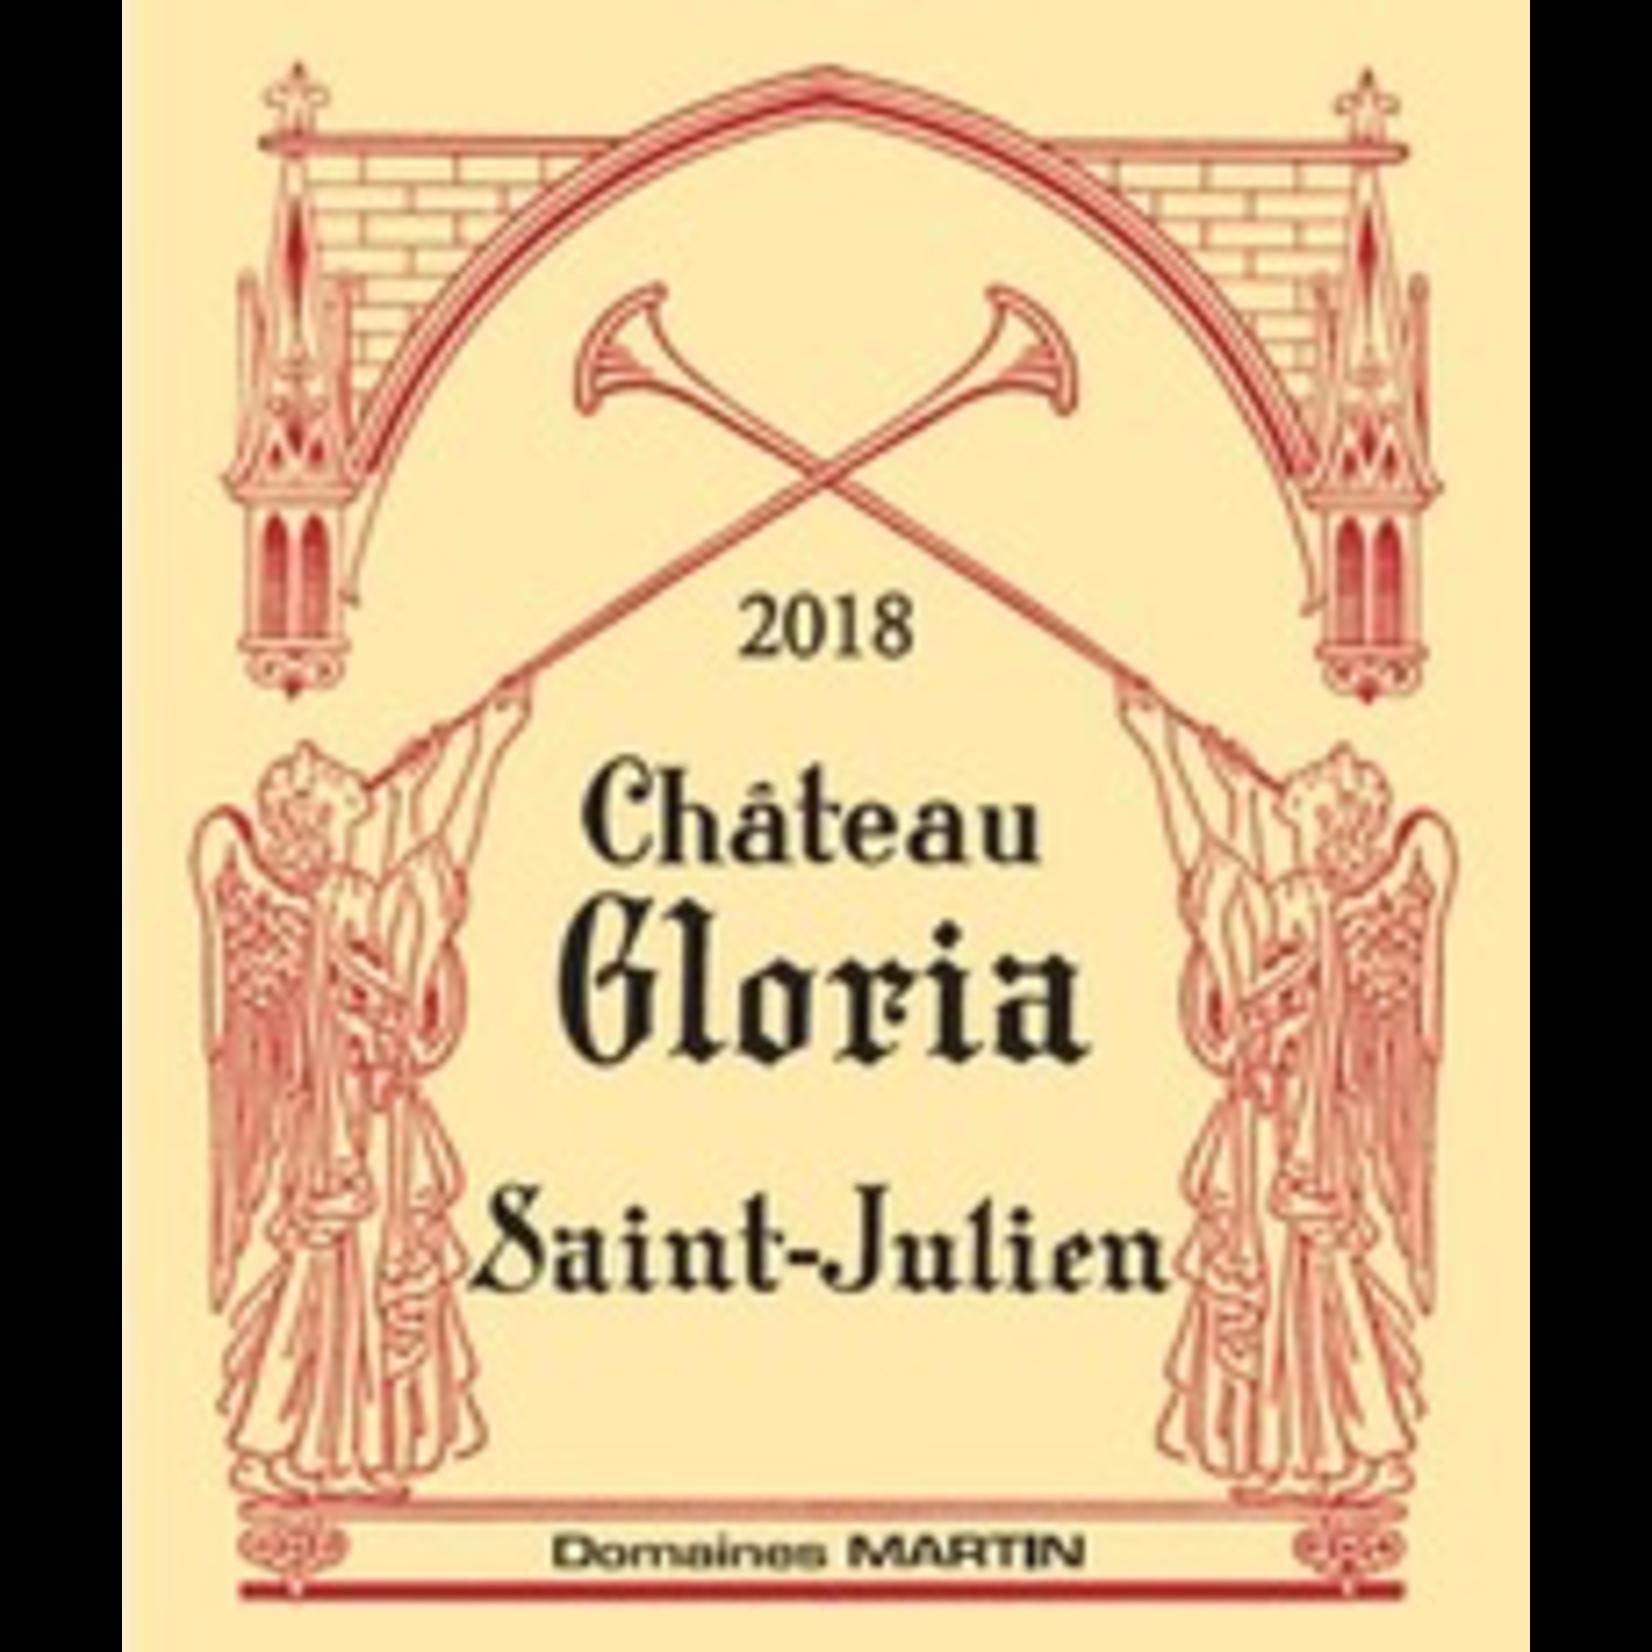 Chateau Gloria Saint Julien 2018